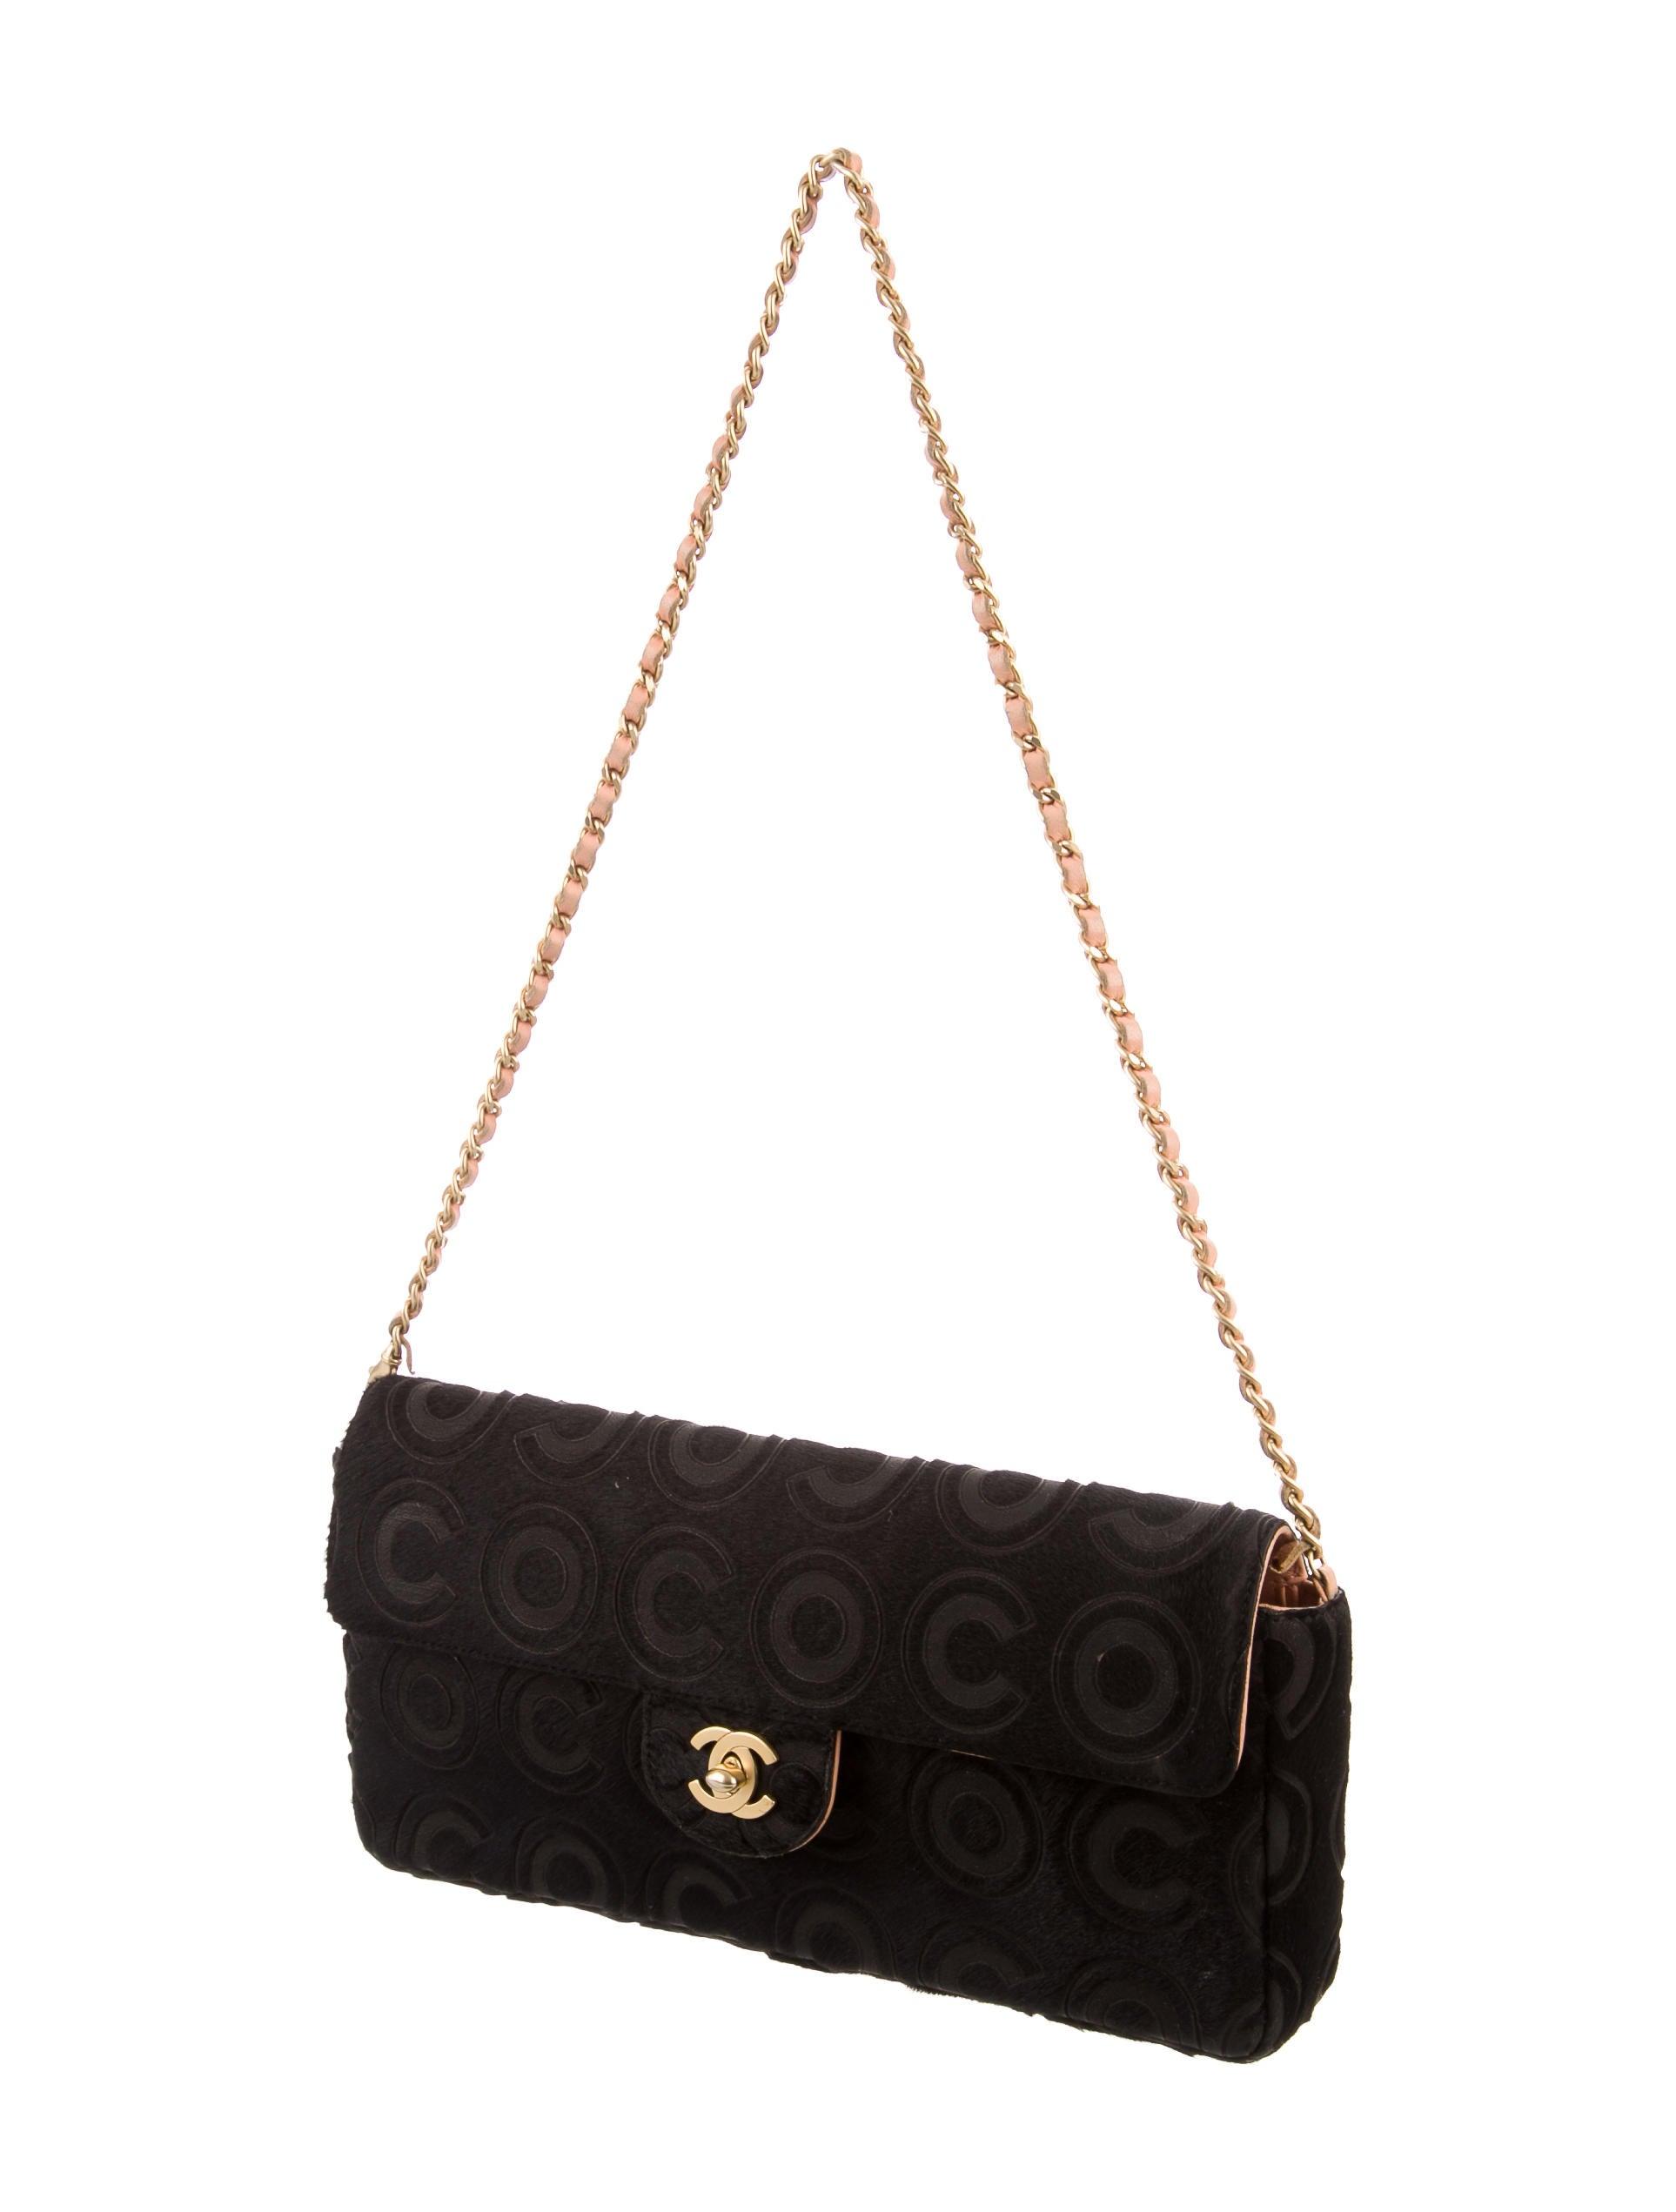 Chanel Coco Ponyhair E/W Flap Bag - Handbags - CHA127167 ...